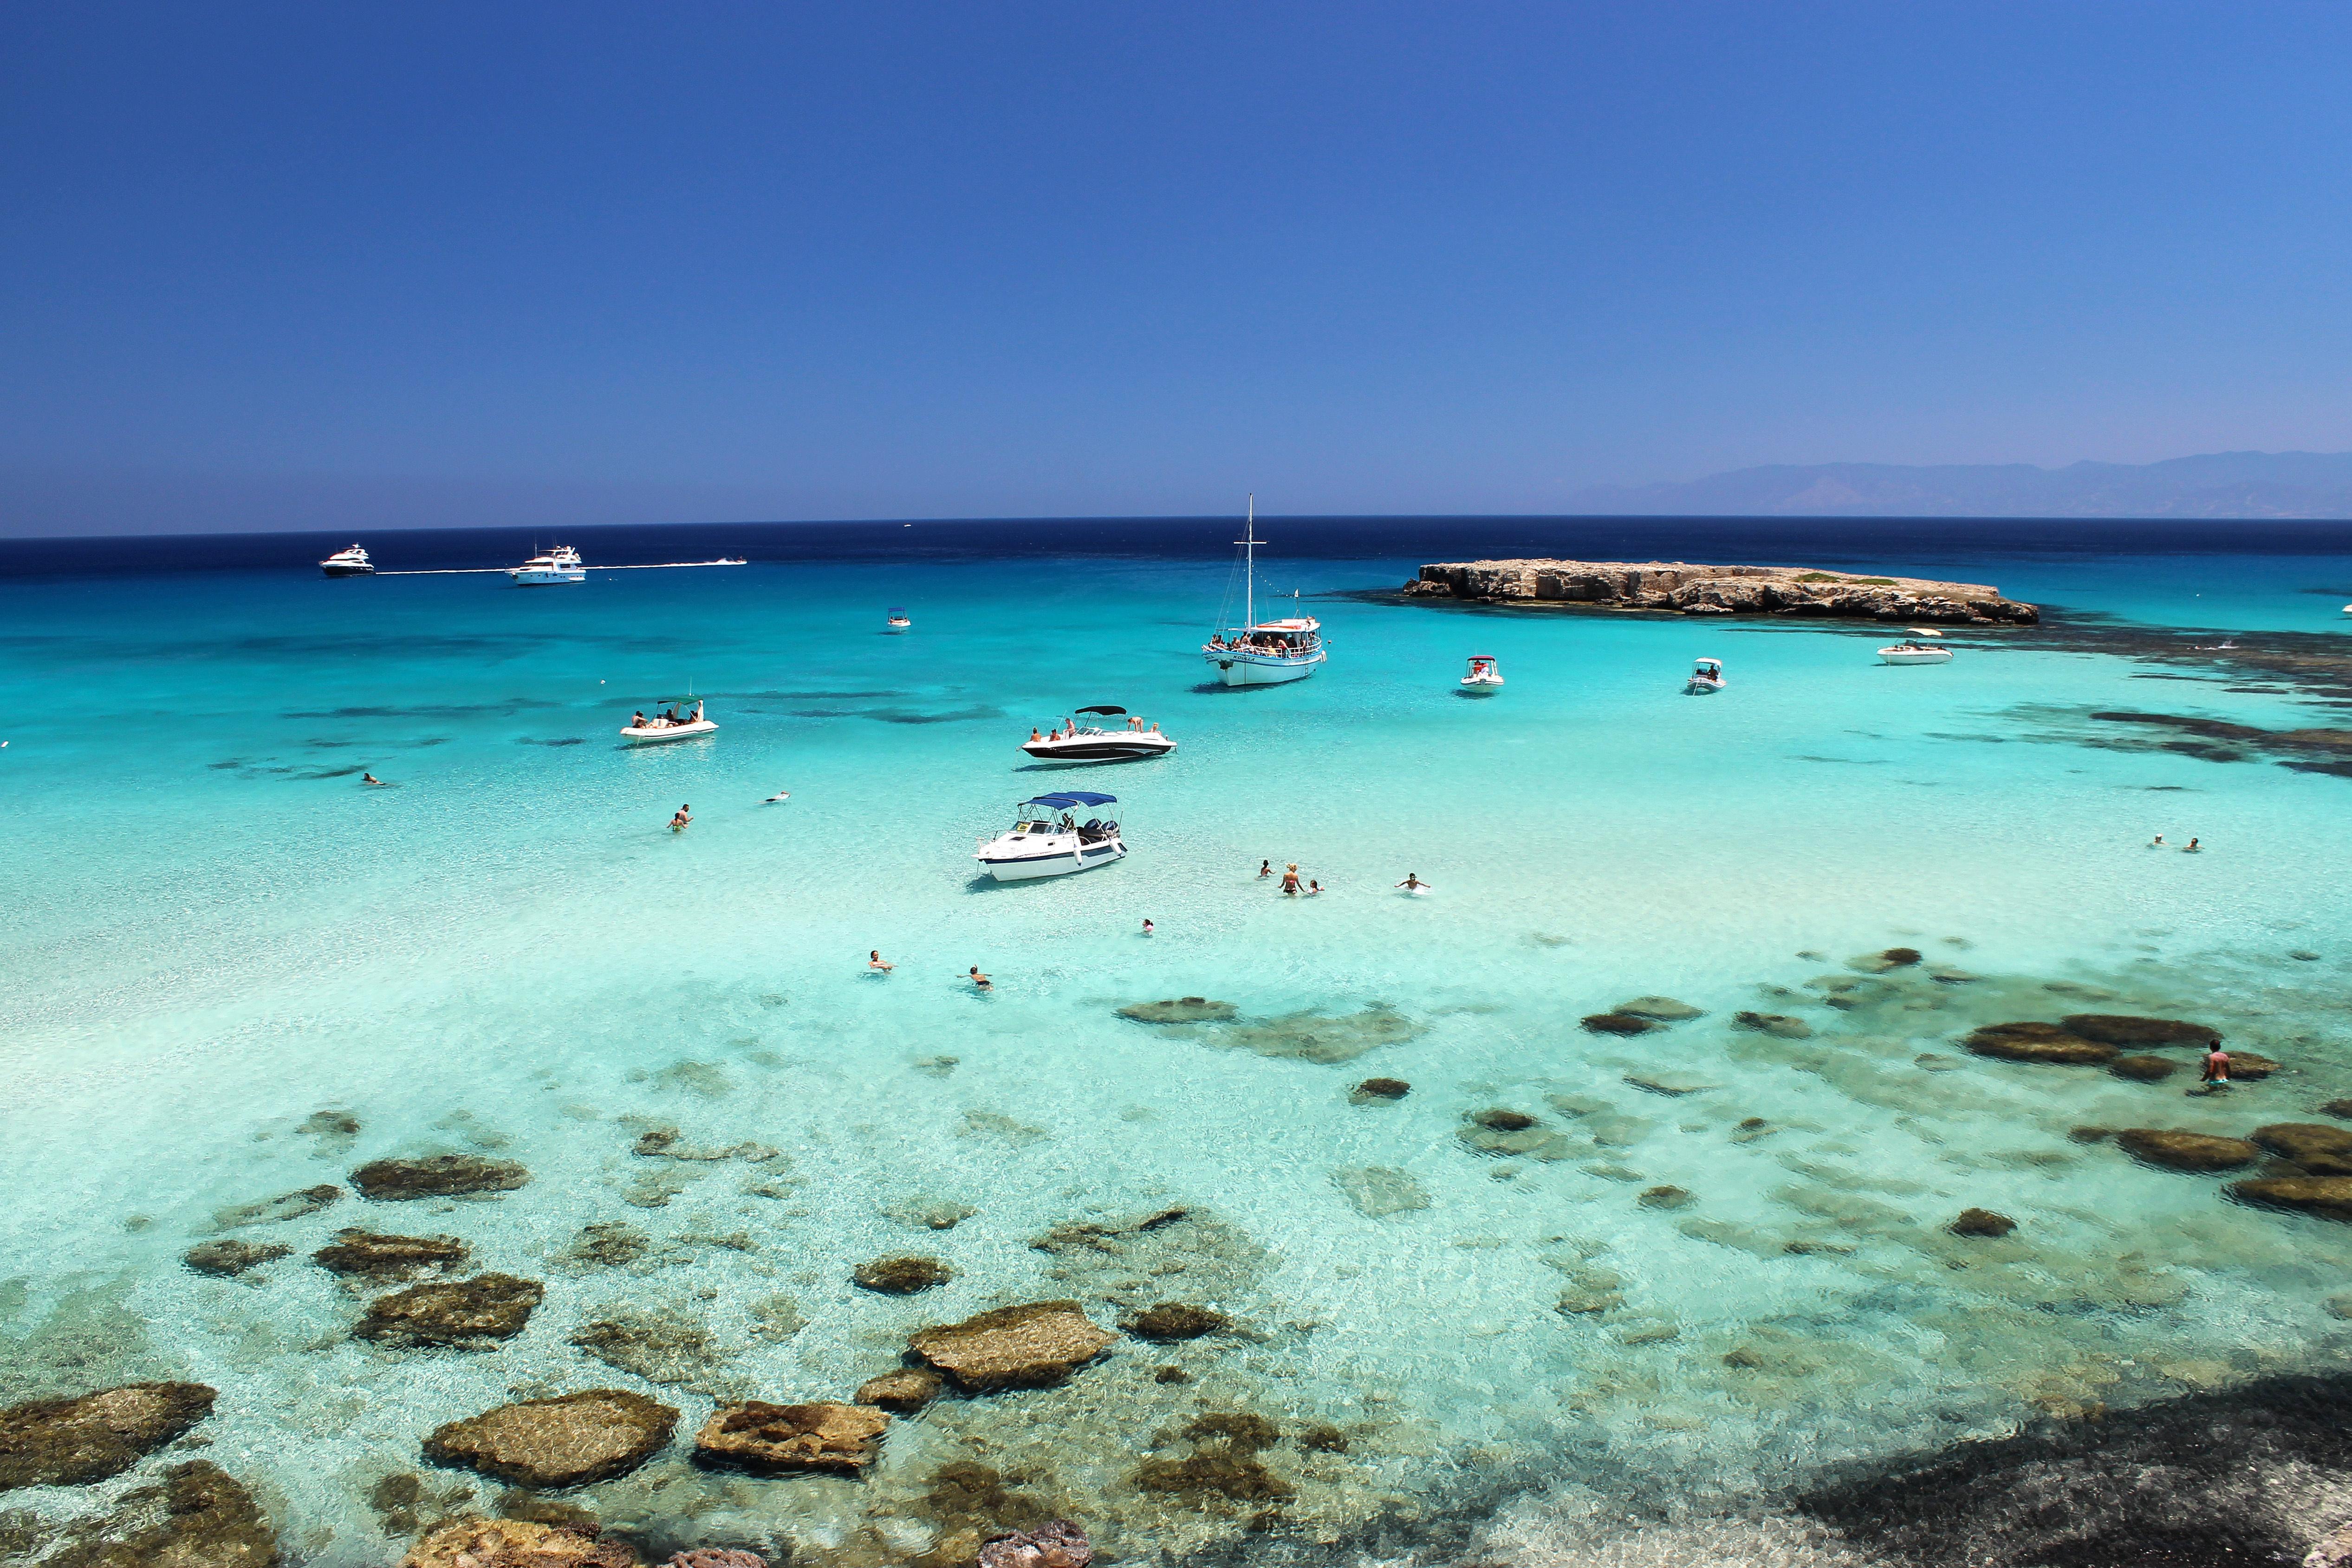 Ciprus, ahol még novemberben is nyár van…